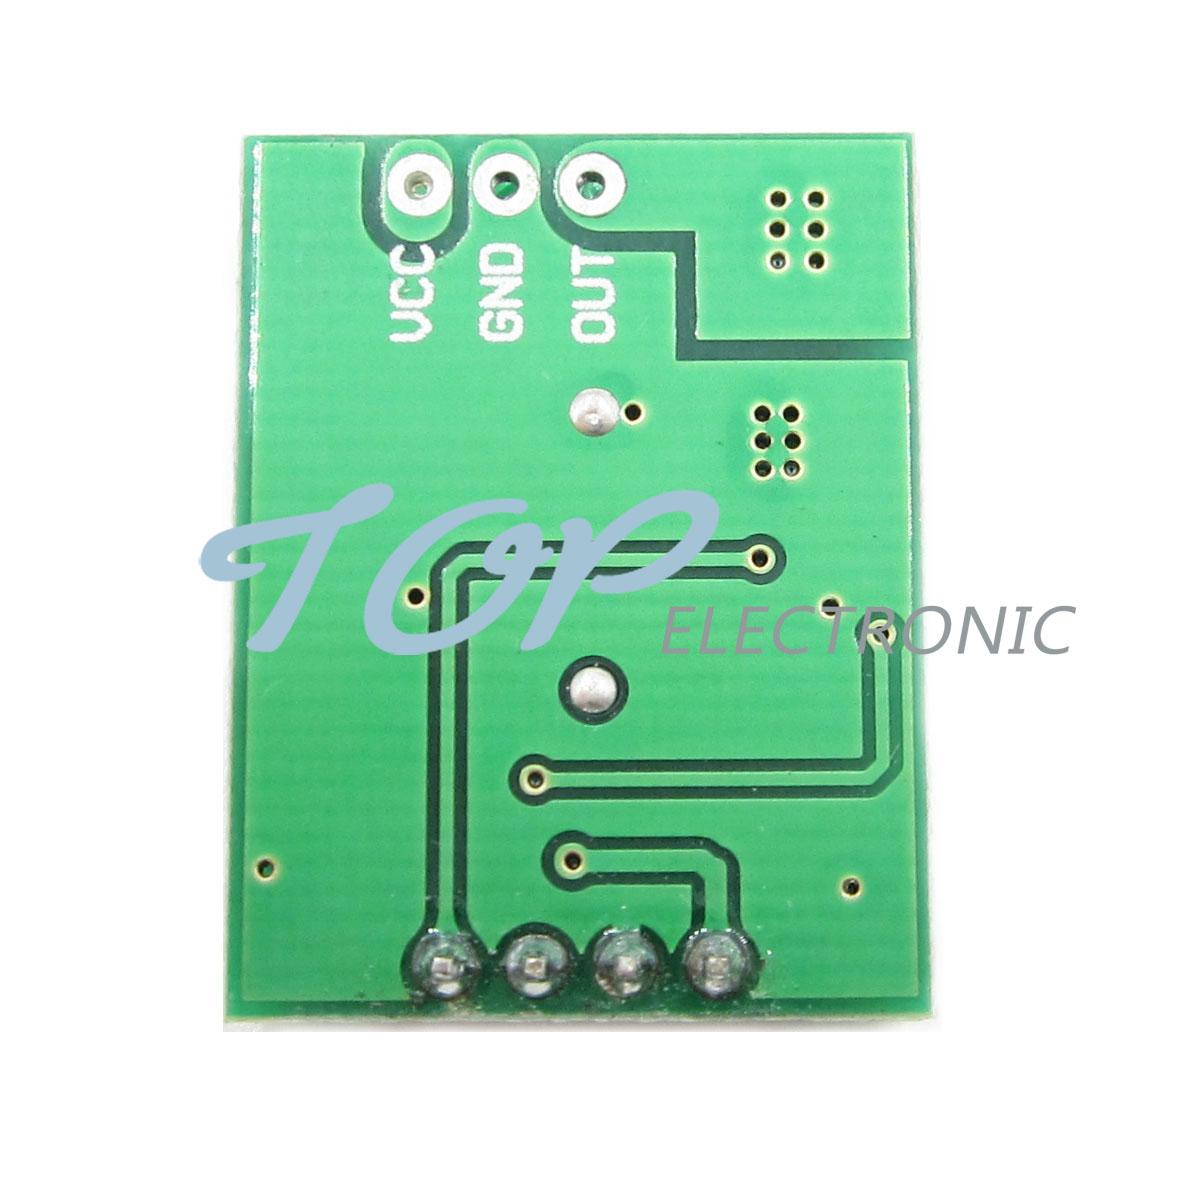 2PCS 8-24V 20A Precise Radar Sensor 2.7GHz Microwave Induction board Sensor